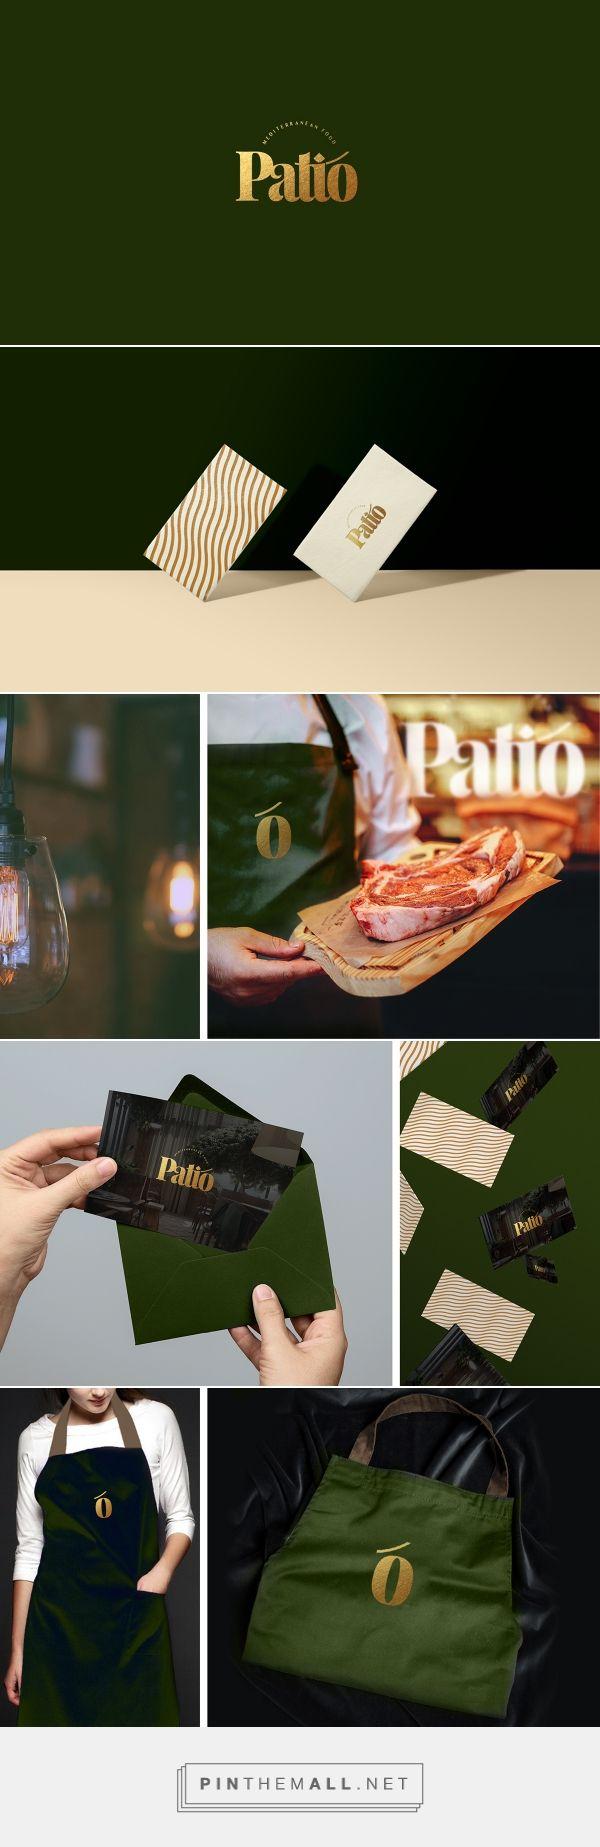 Patio Restaurant Branding by Joe El Helou on Behance | Fivestar Branding – Design and Branding Agency & Inspiration Gallery